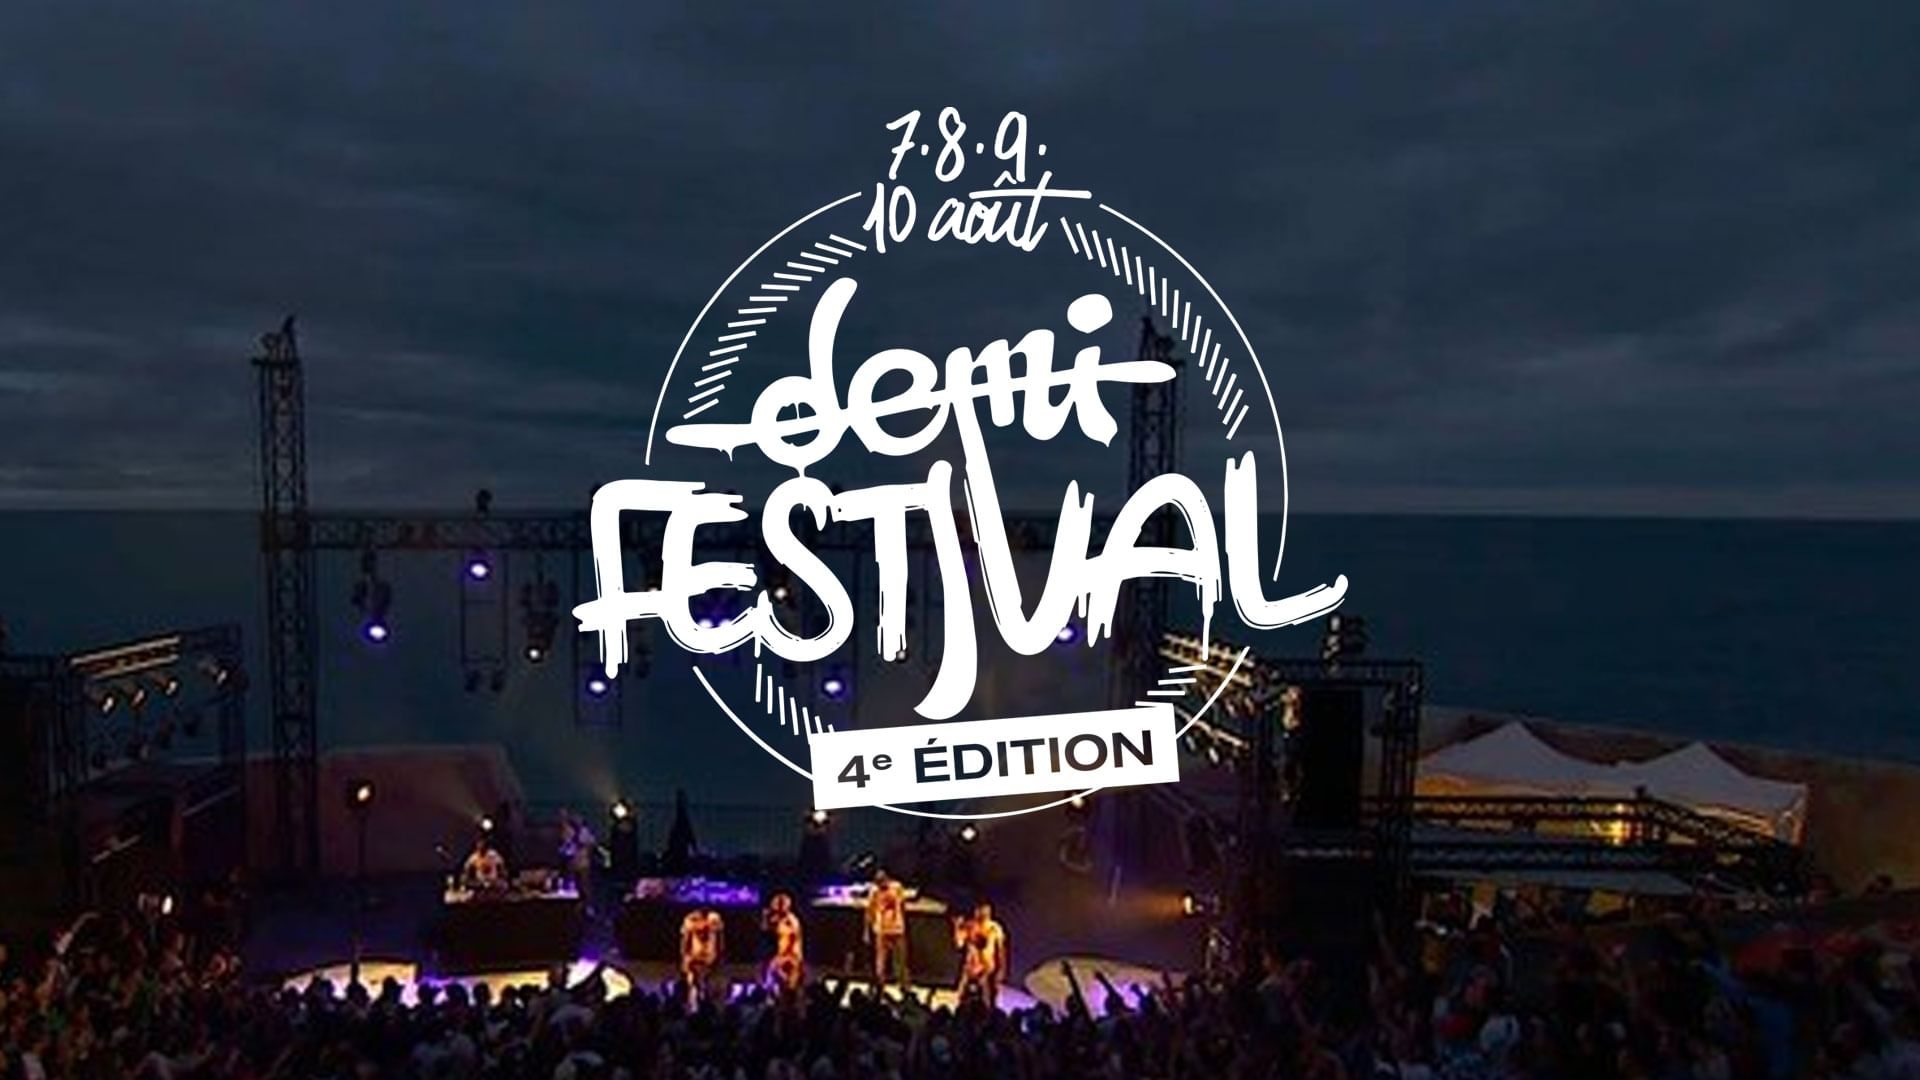 Demi Festival